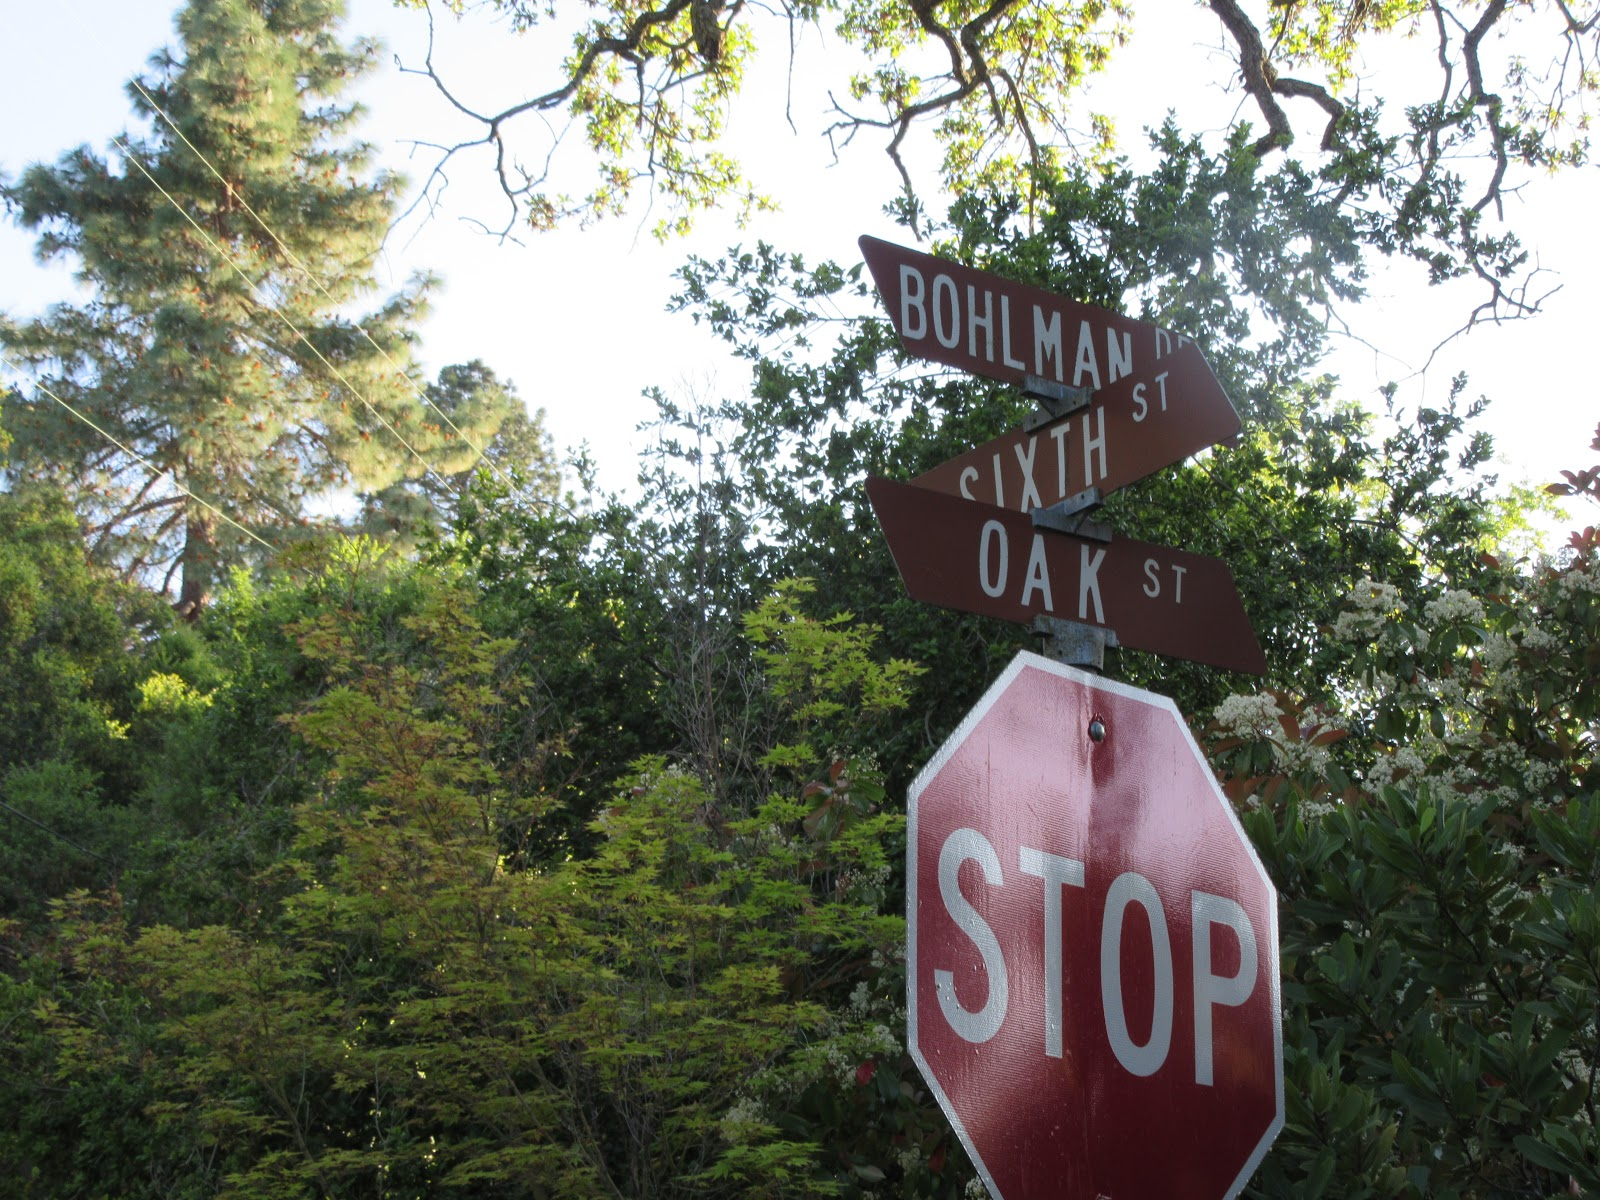 Cycling Bohlman Road - start, street sign